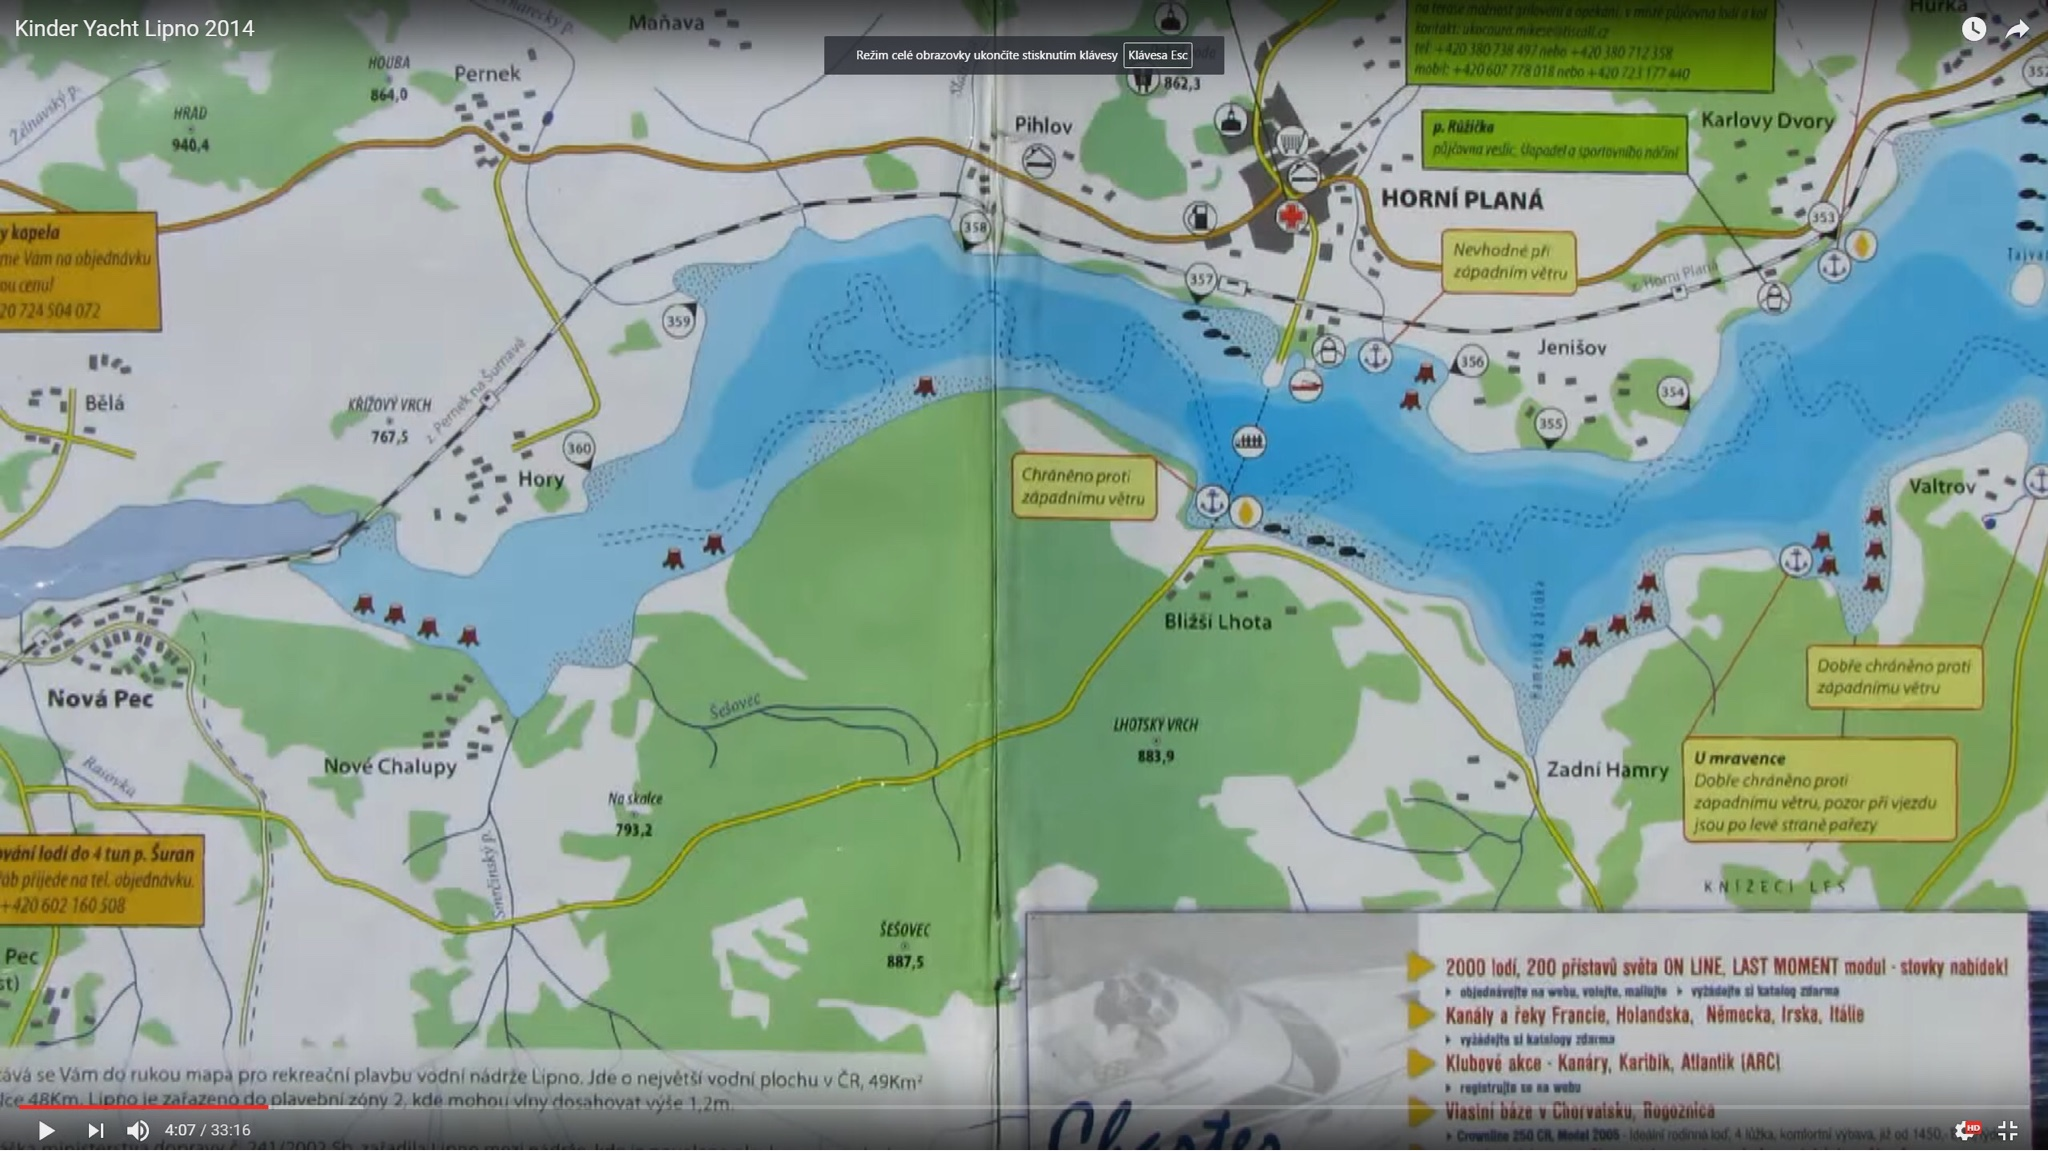 Mapa Vodni Nadrze Lipno Jachting Info